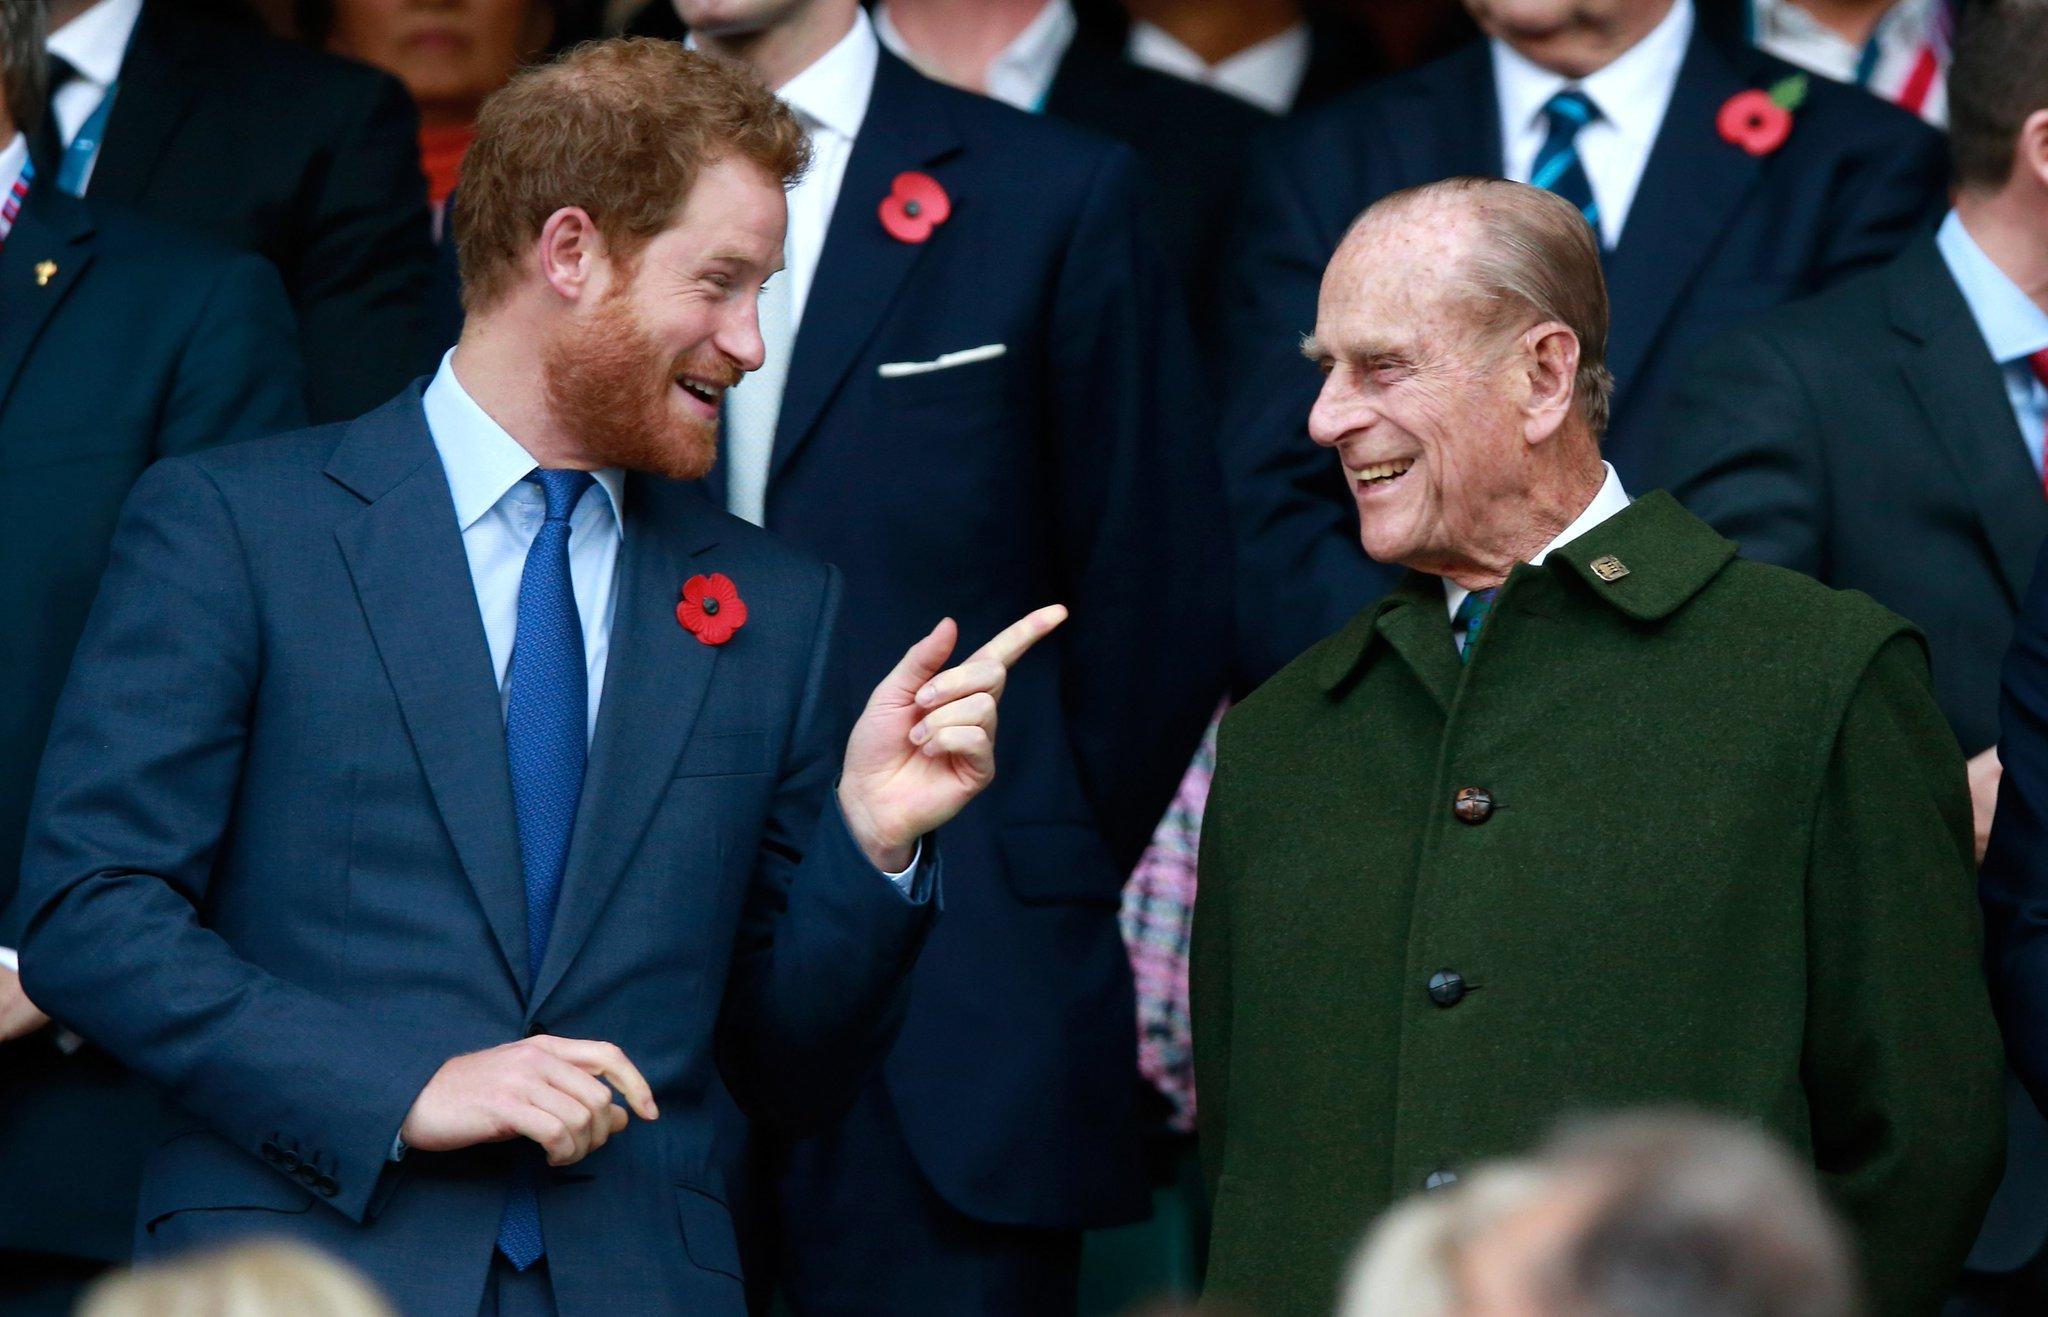 Happy 98th birthday to Prince Philip!